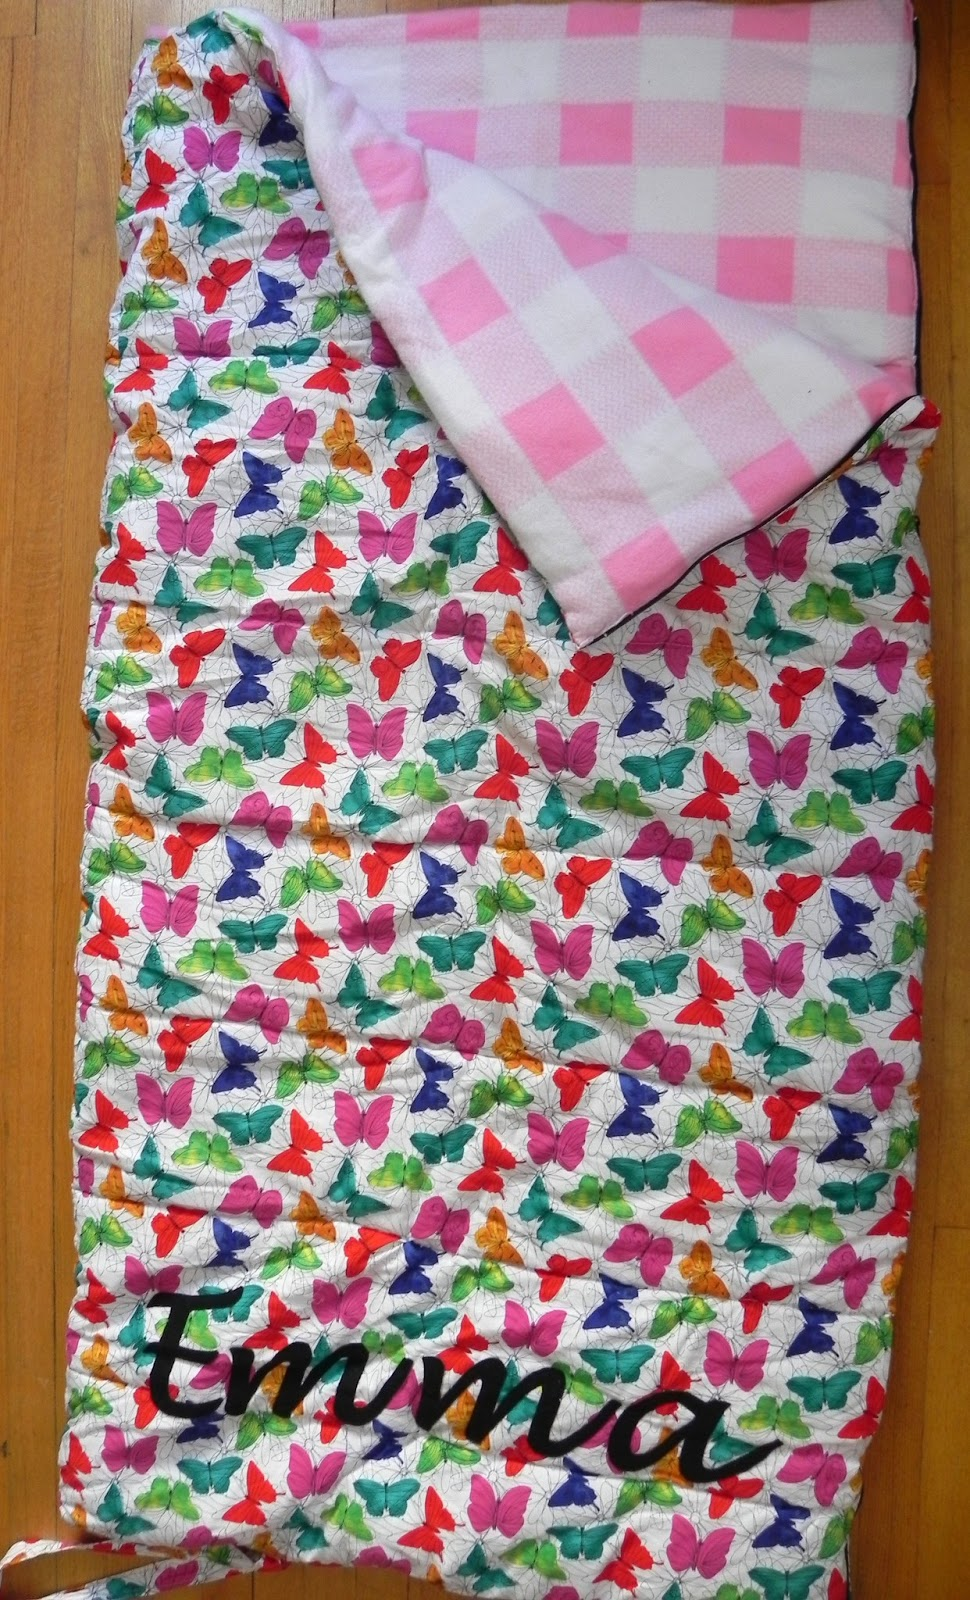 Littlepunkinpie Child Outdoor Sleeping Bag Tutorial